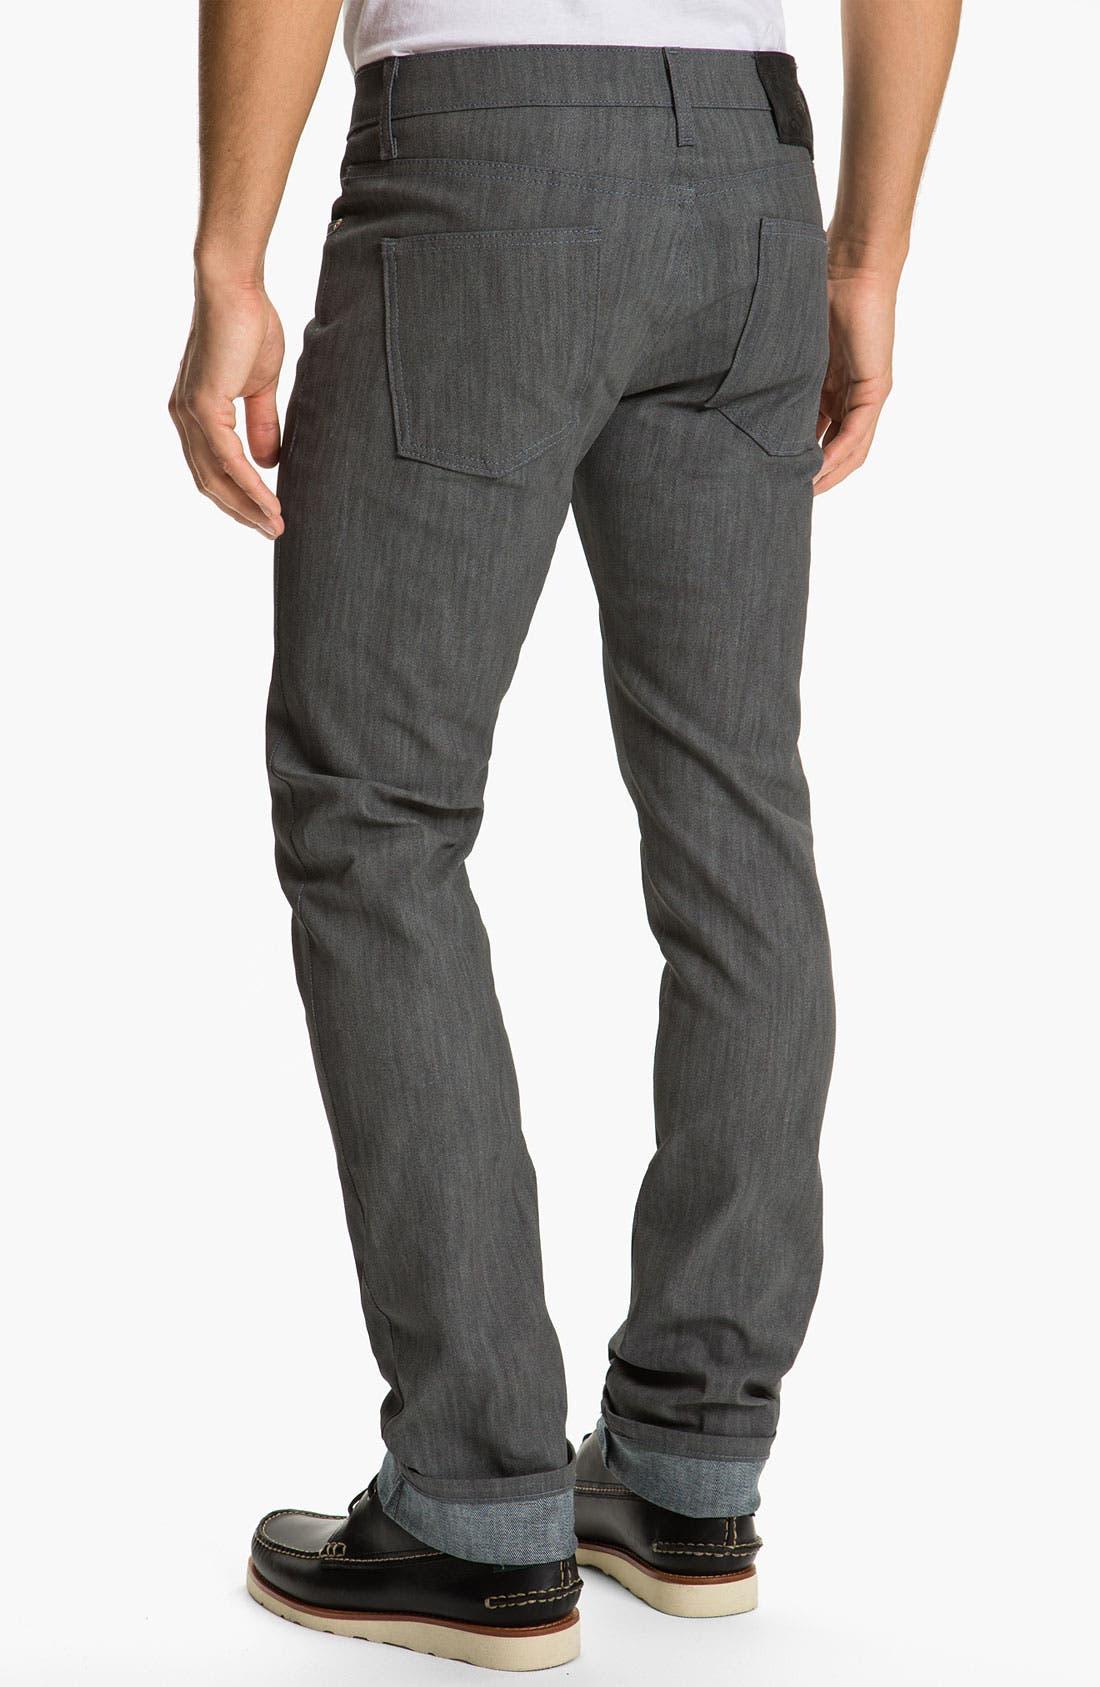 Alternate Image 1 Selected - Naked & Famous Denim 'Skinny Guy' Slim Straight Leg Jeans (Grey Glow In The Dark)